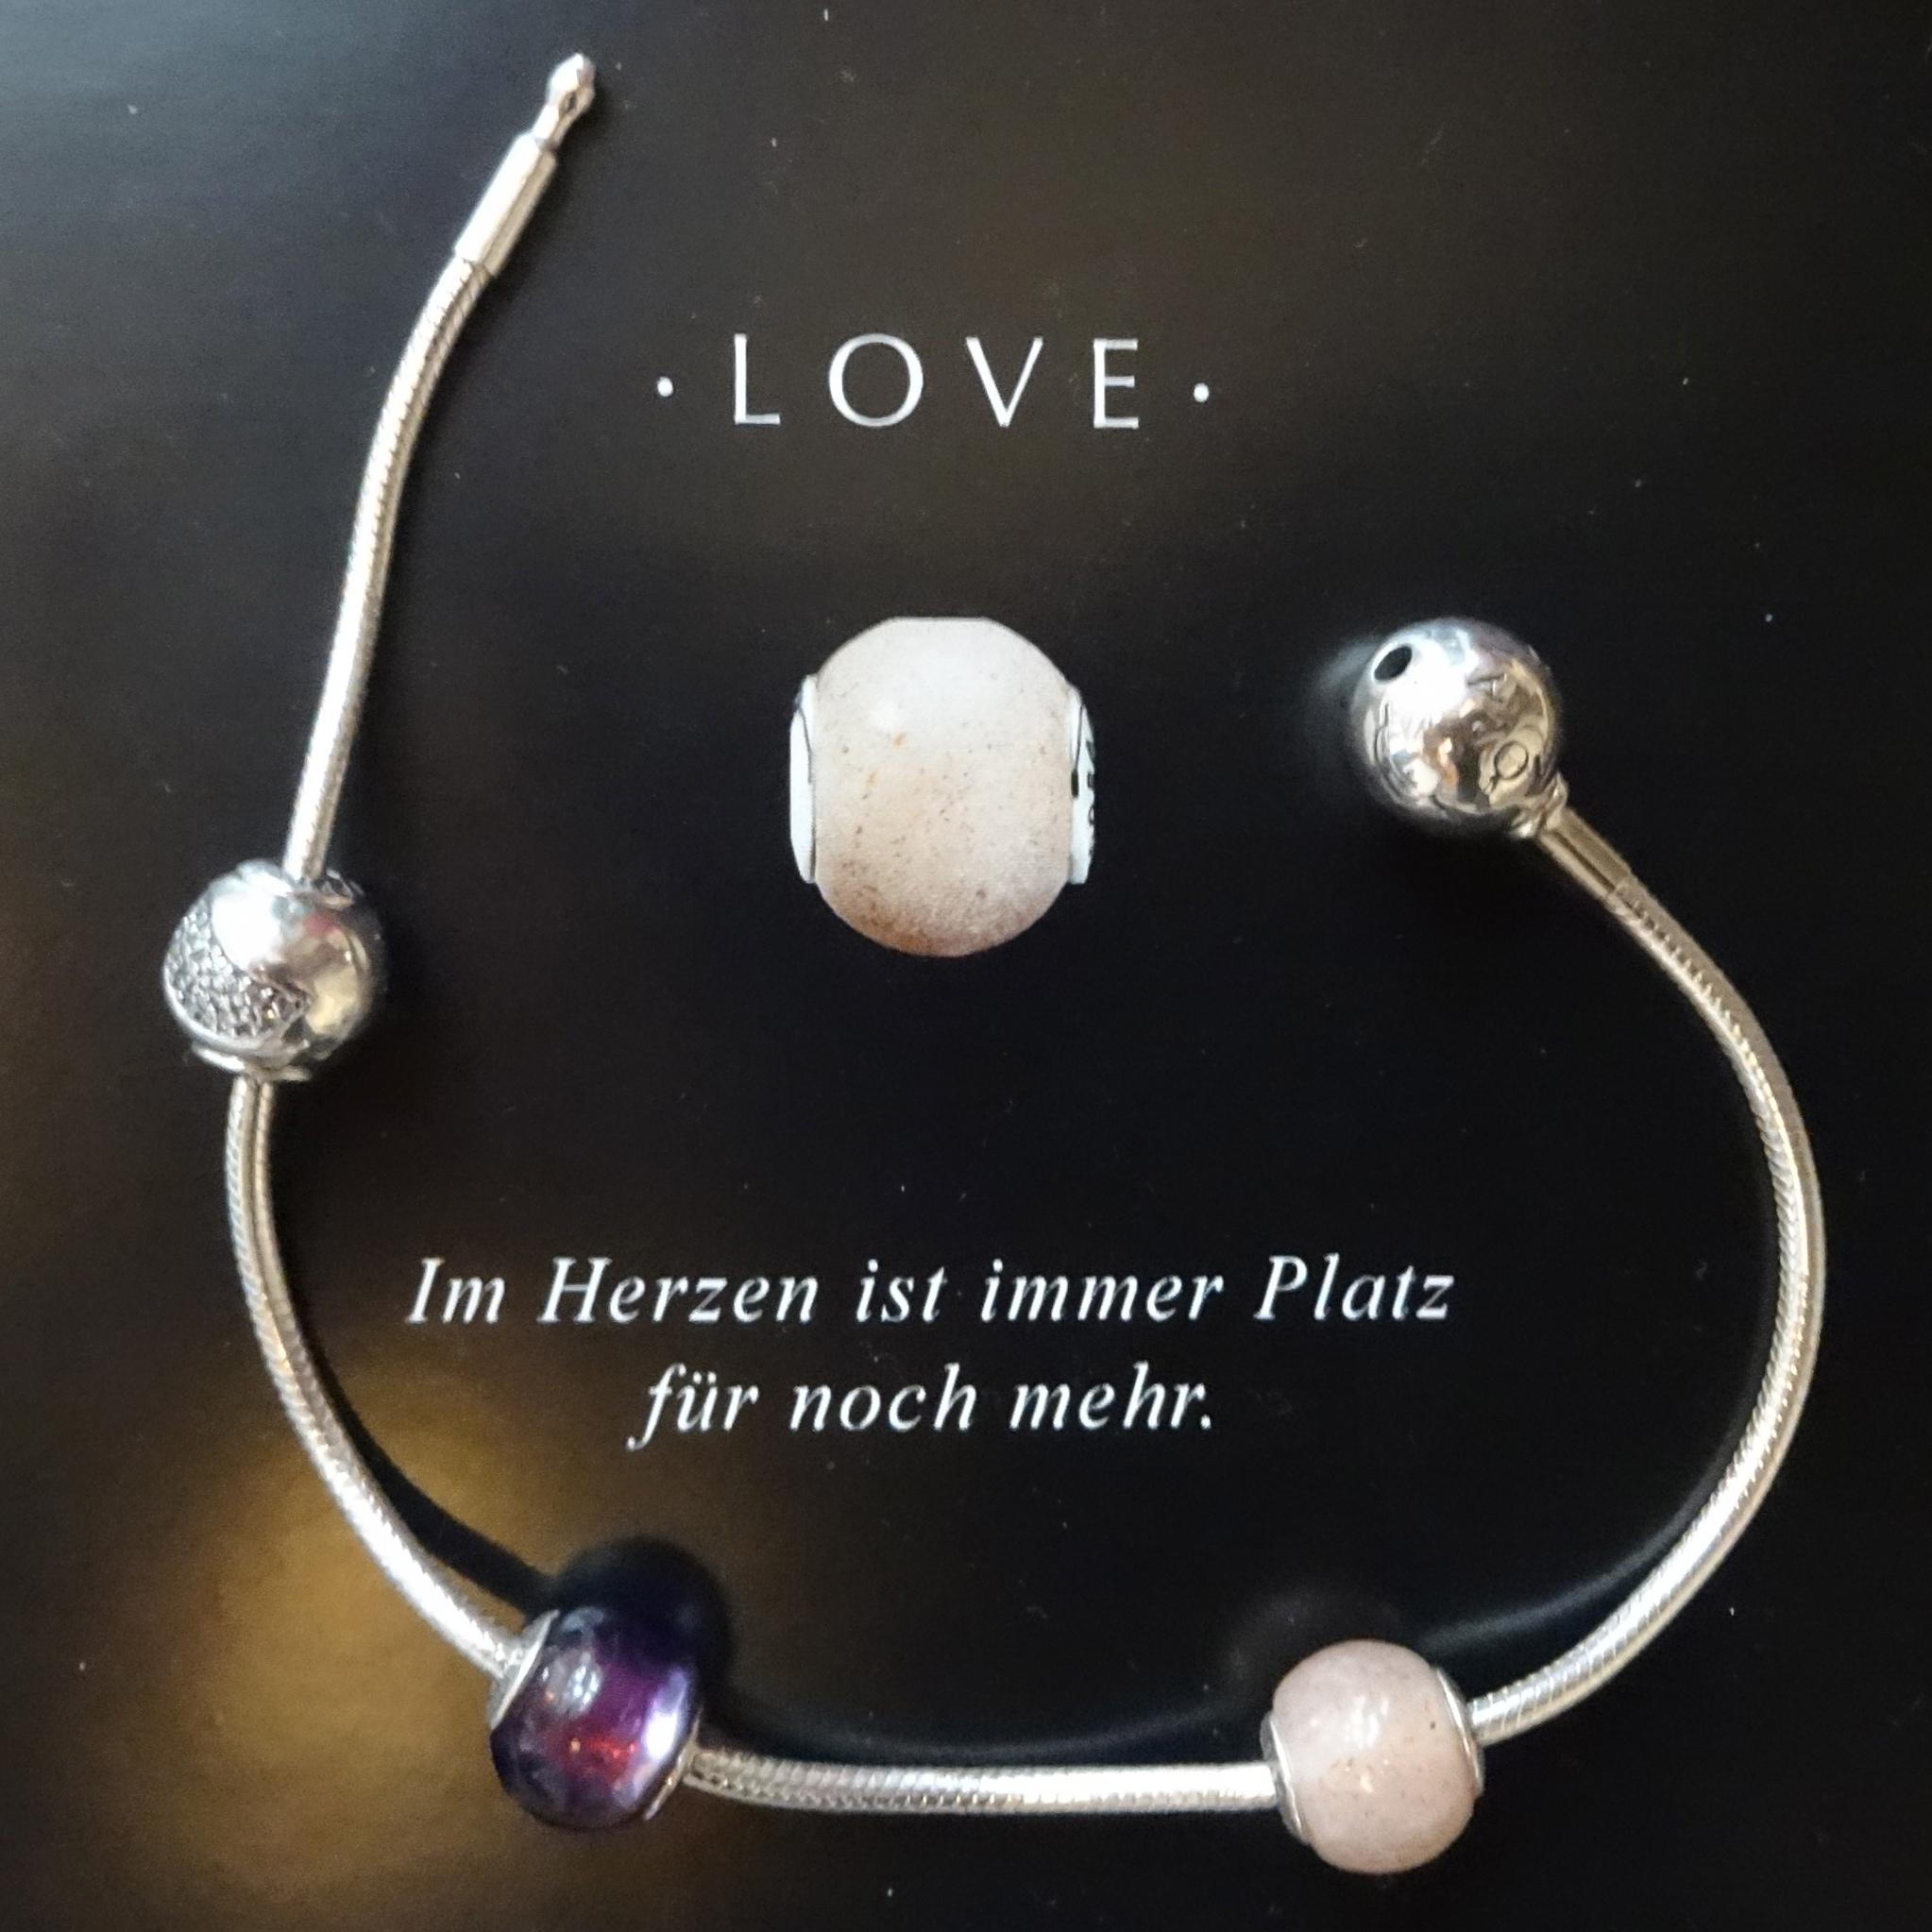 Happiness / Glück, Faith / Glaube, Love / Liebe